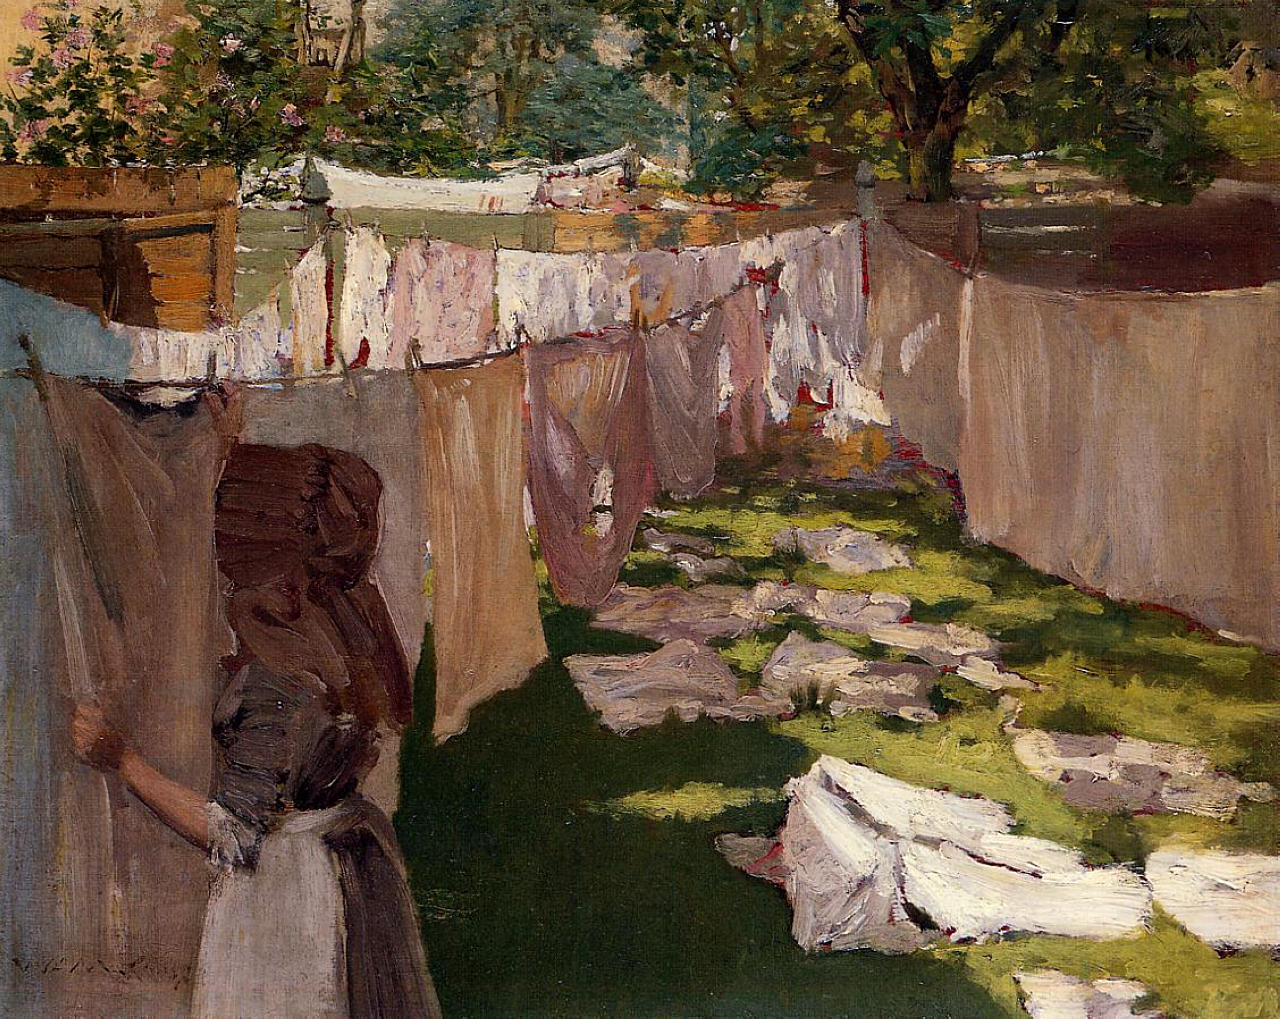 hanging up the wash in a brooklyn backyard ephemeral new york